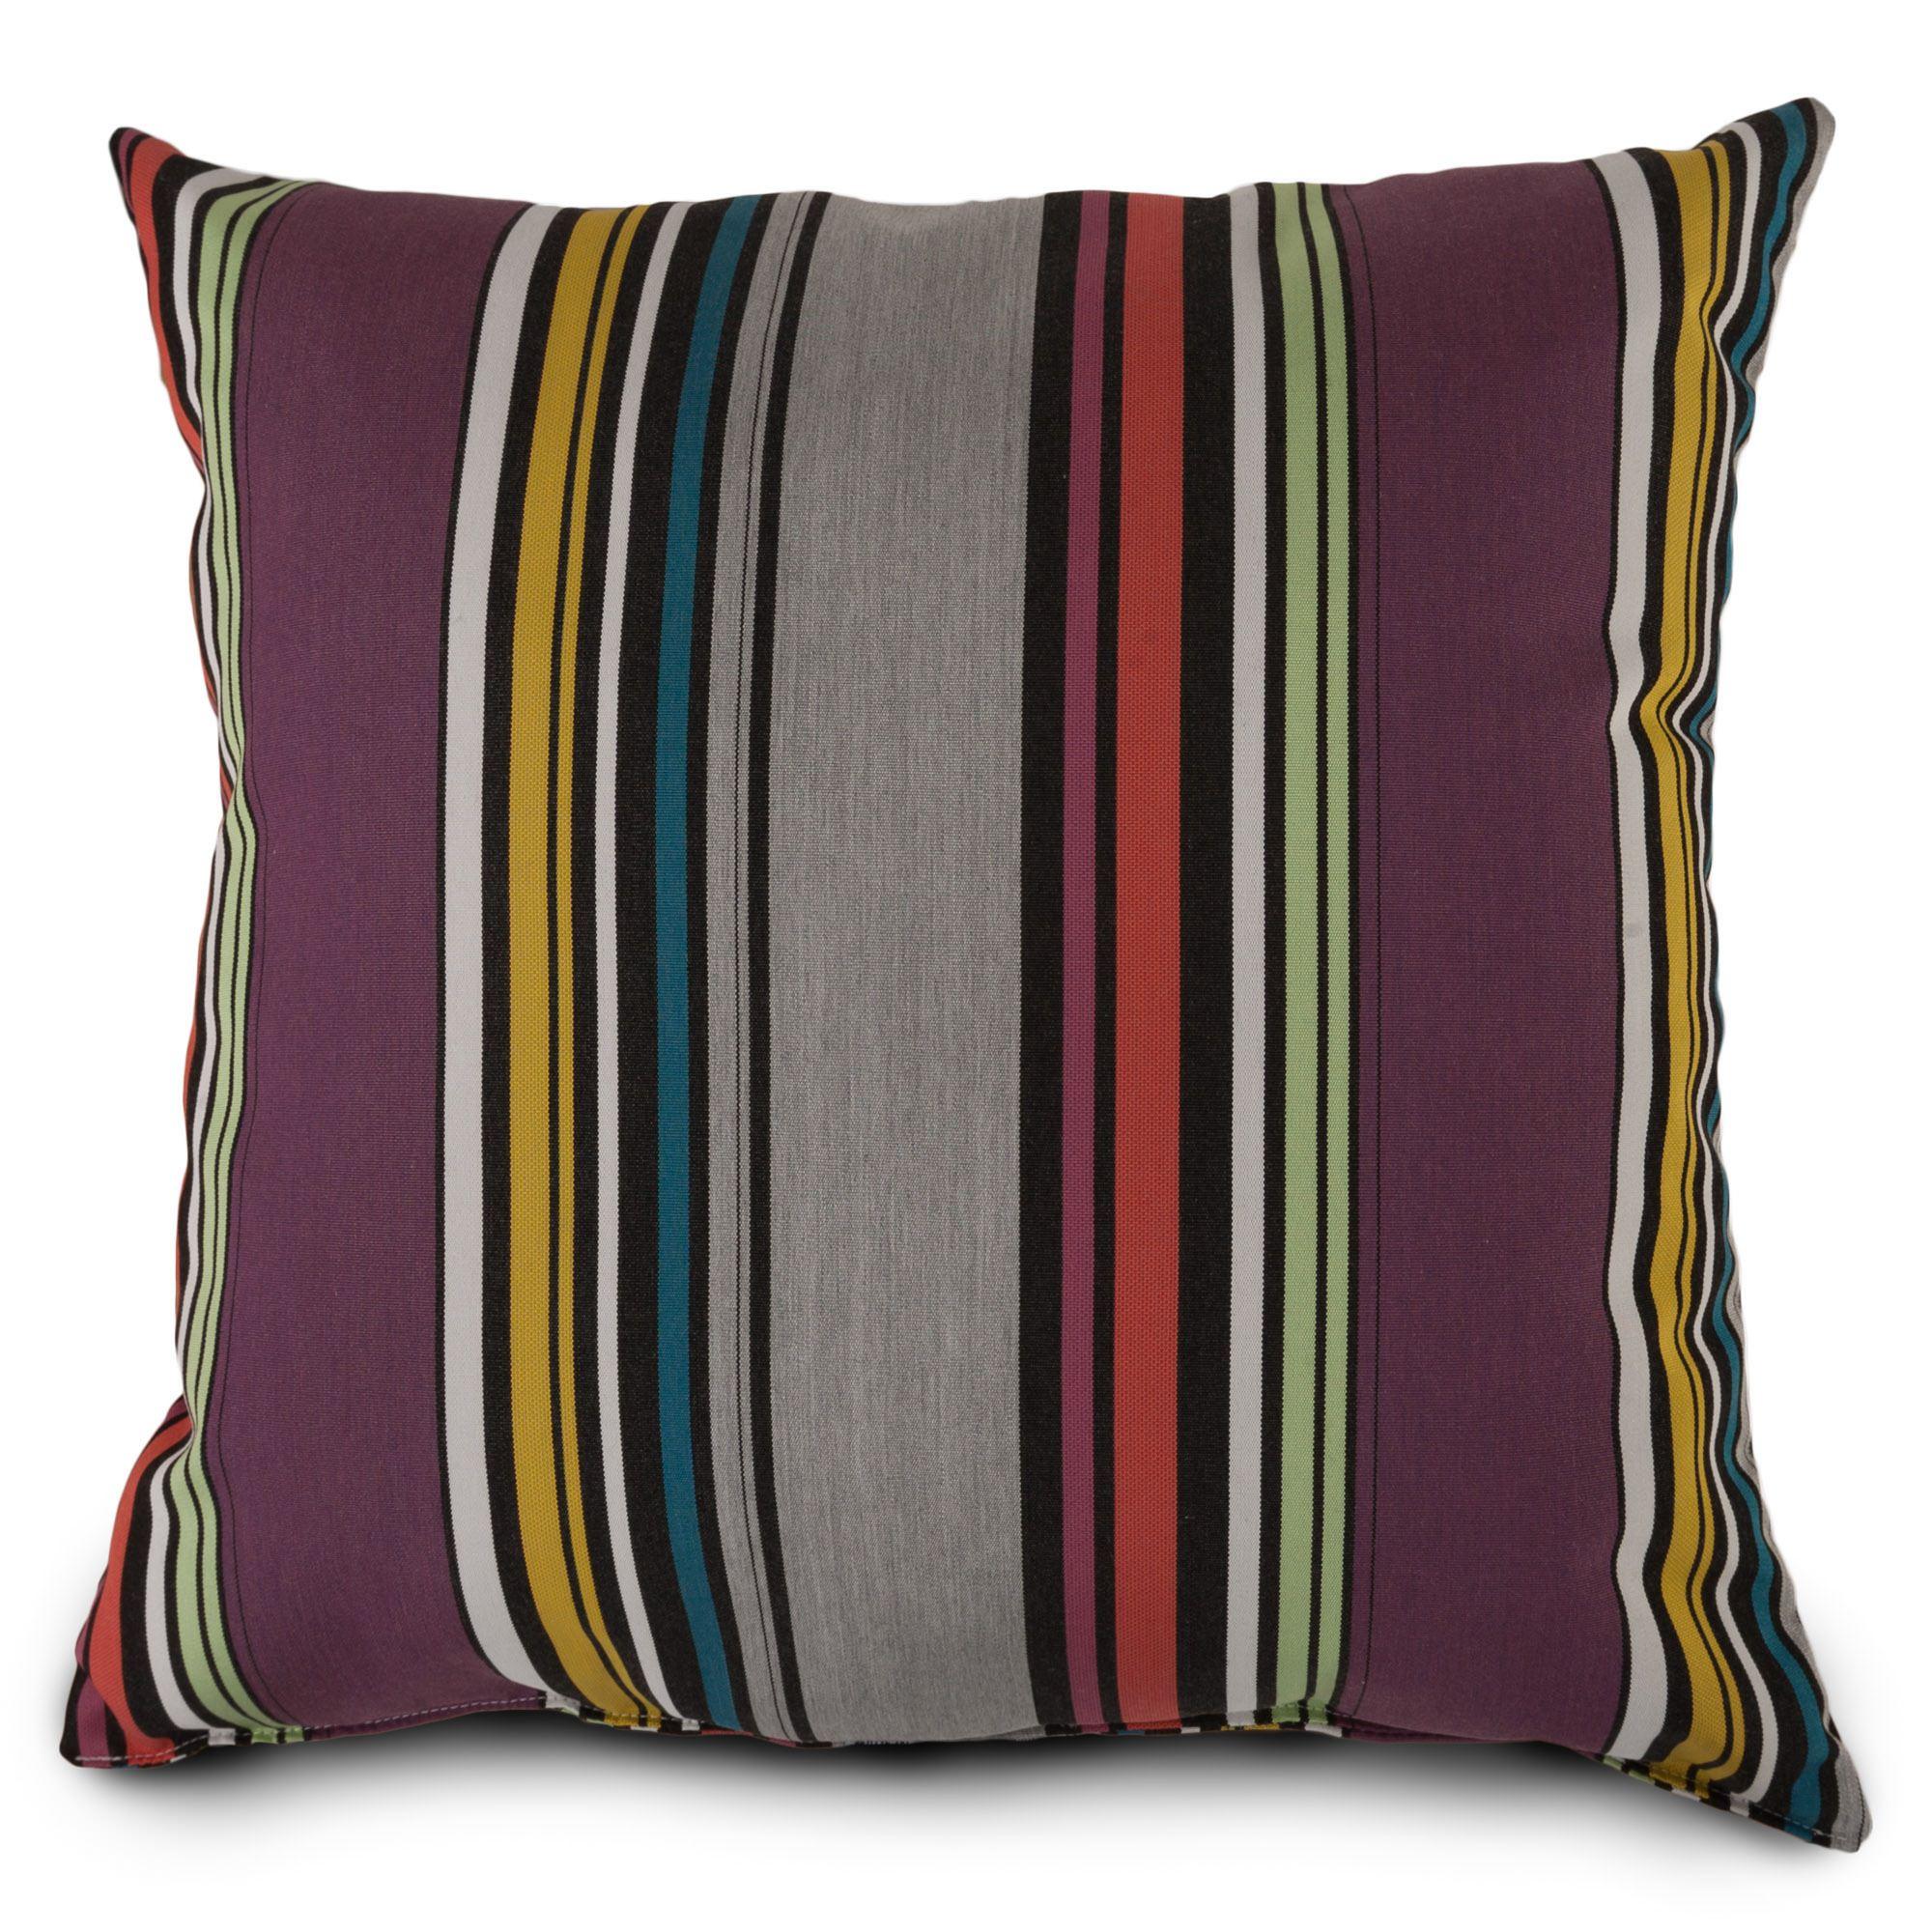 Icon Mystique Sunbrella Outdoor Pillow